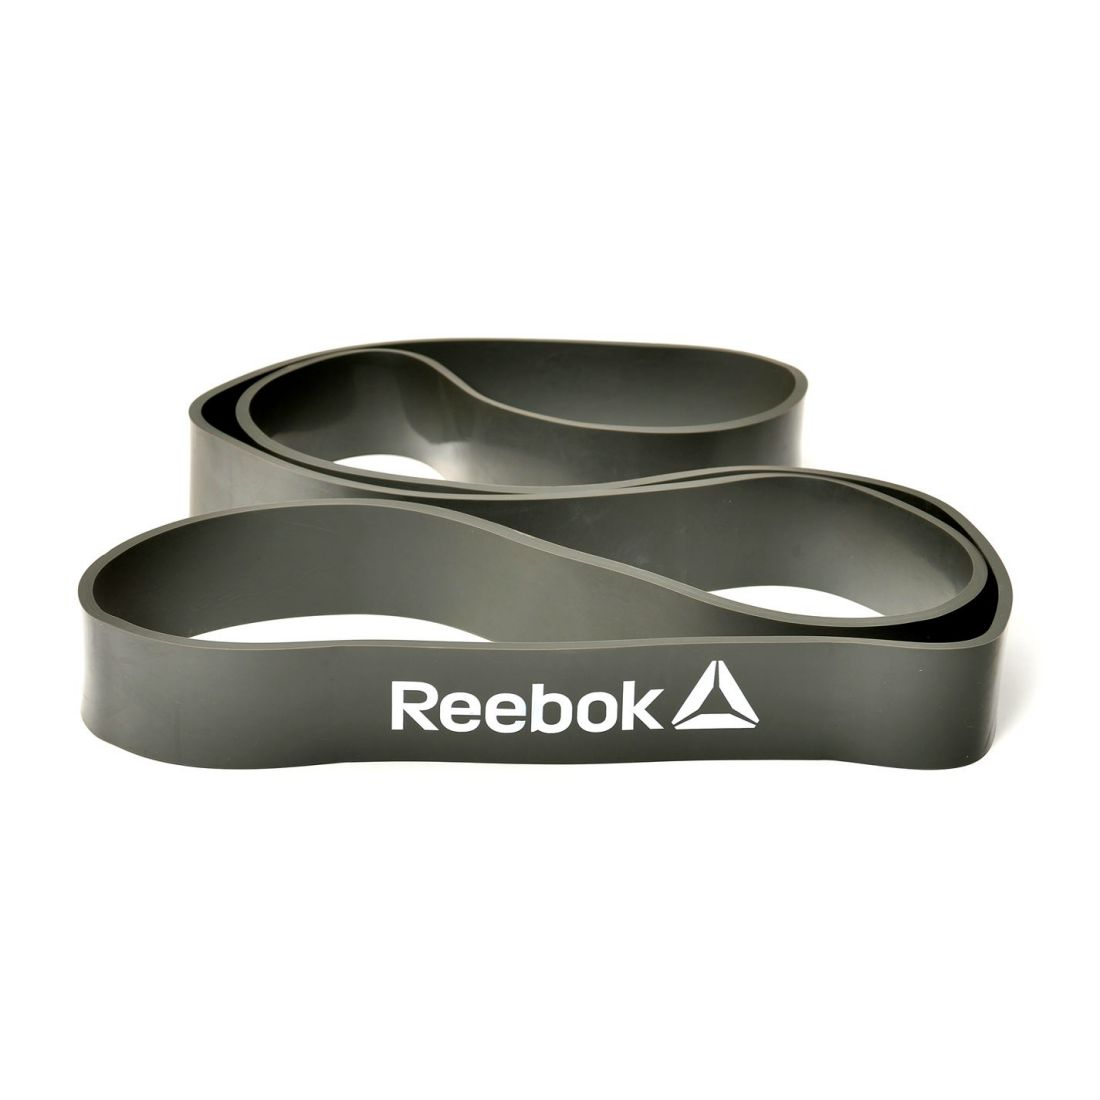 Reebok Power Band Unisex Resistance Bands Sport Activity Workout